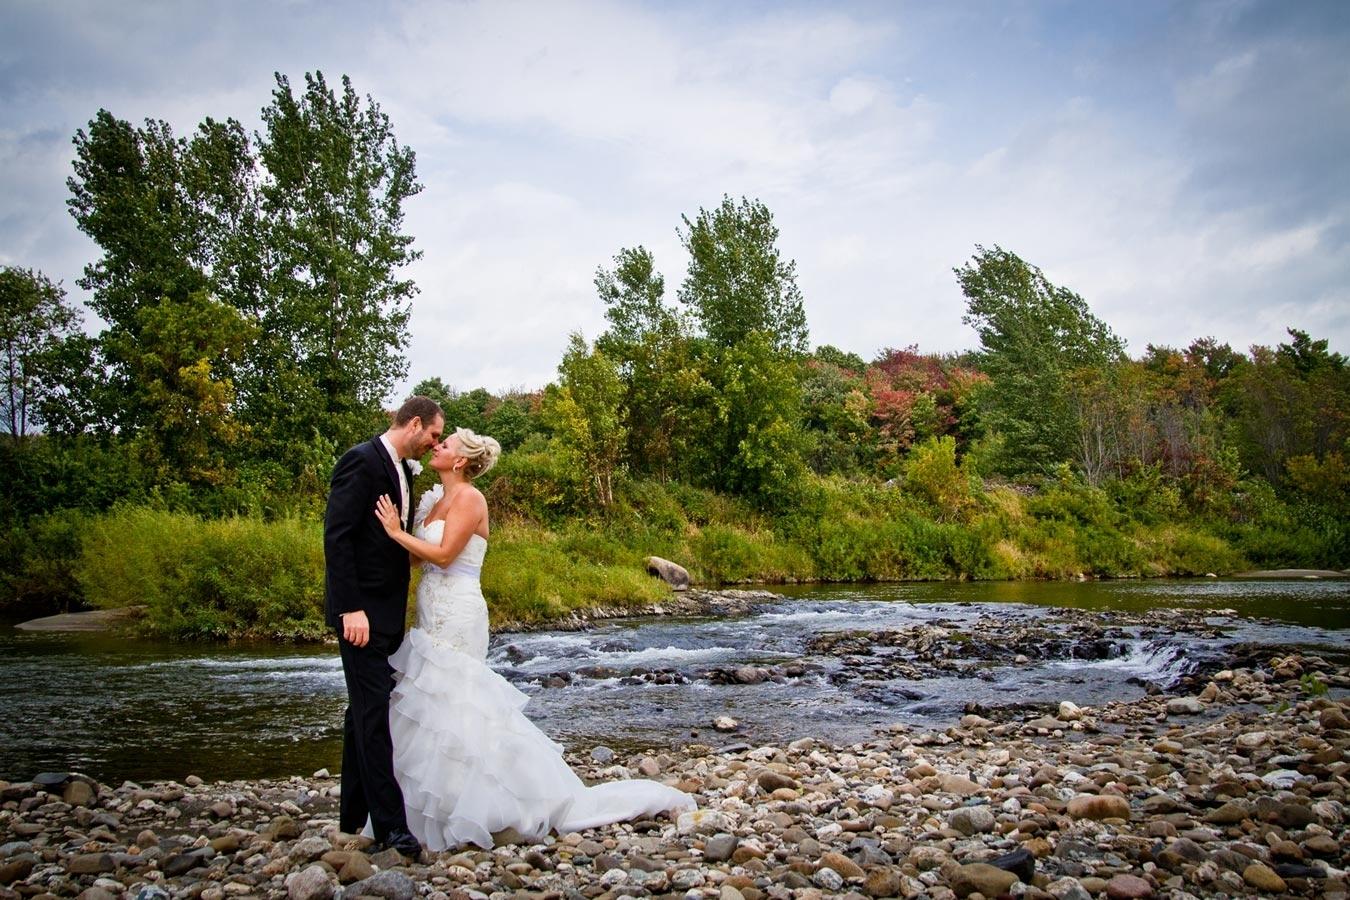 couple-amoureux-mariage-natercia-cabeceiras